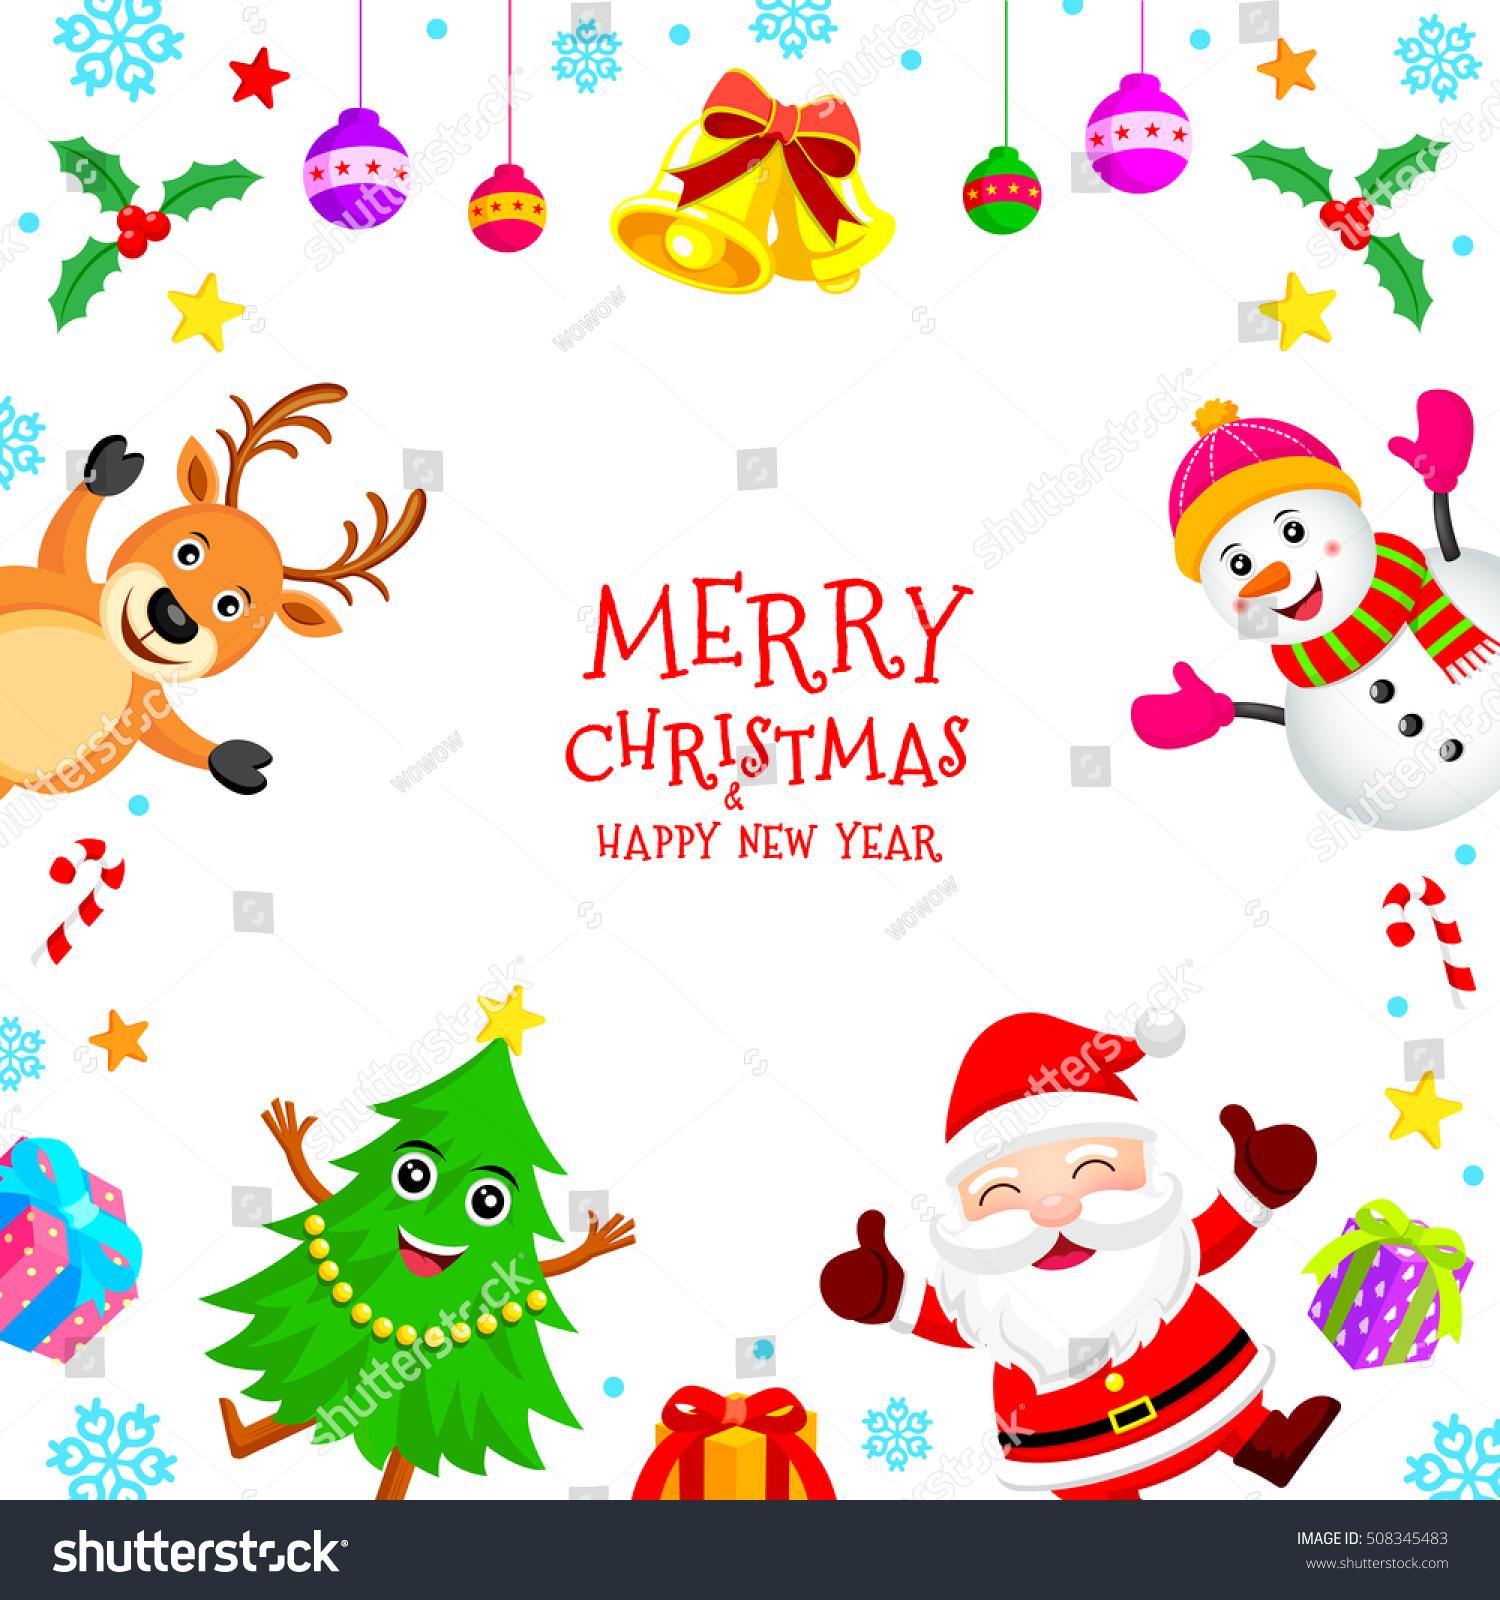 Christmas Characters Frame Santa Claus Snowman Stock Vector (Royalty ...